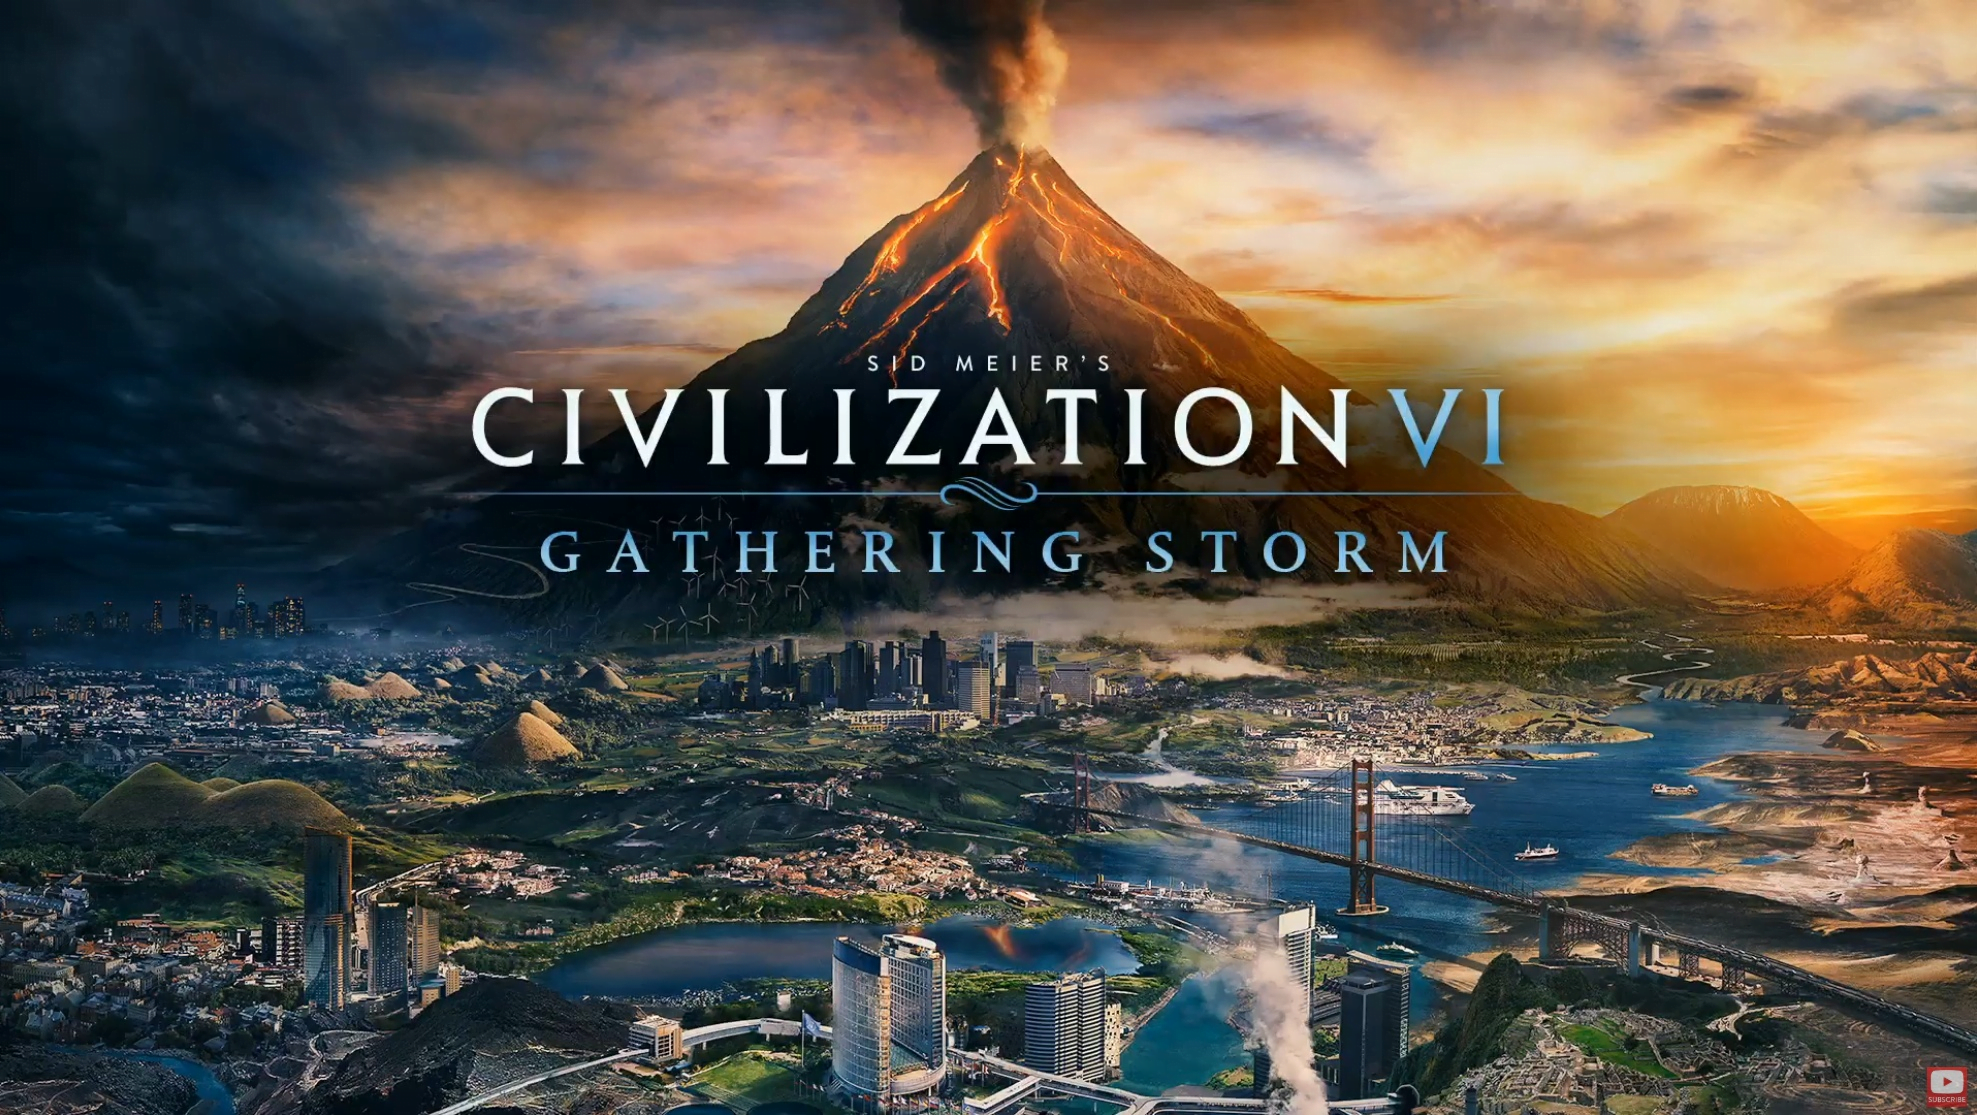 Sid Meier's Civilization VI Gathering Storm Full Version Free